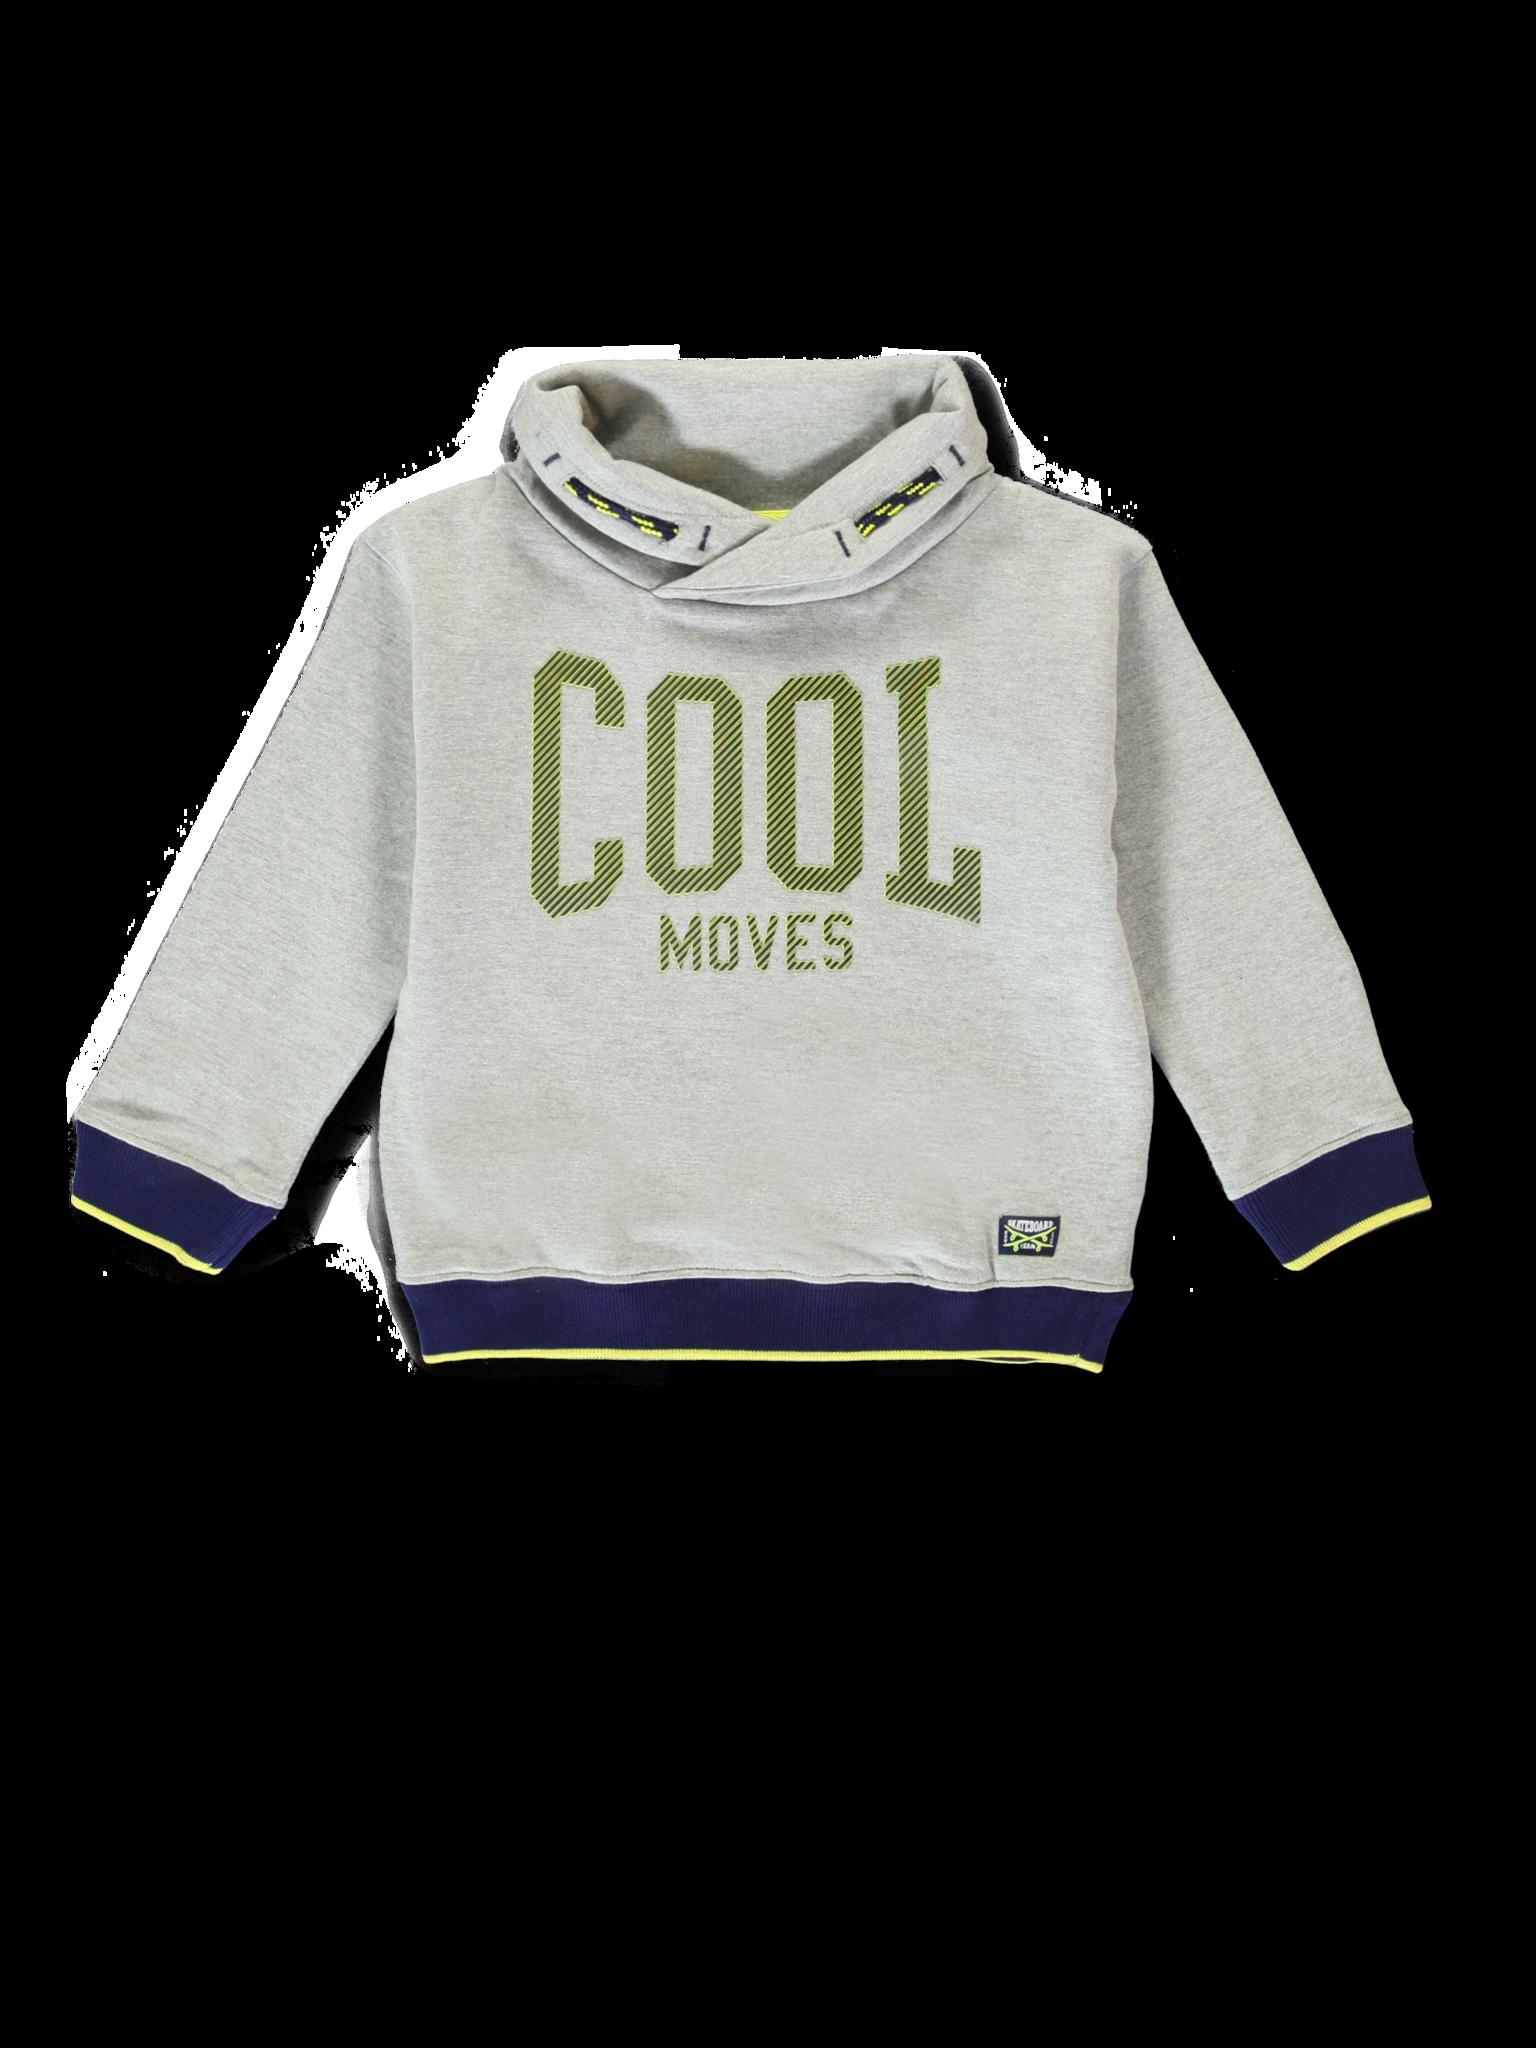 All Brands | Winterproducts Small Boys | Sweatshirt | 12 pcs/box